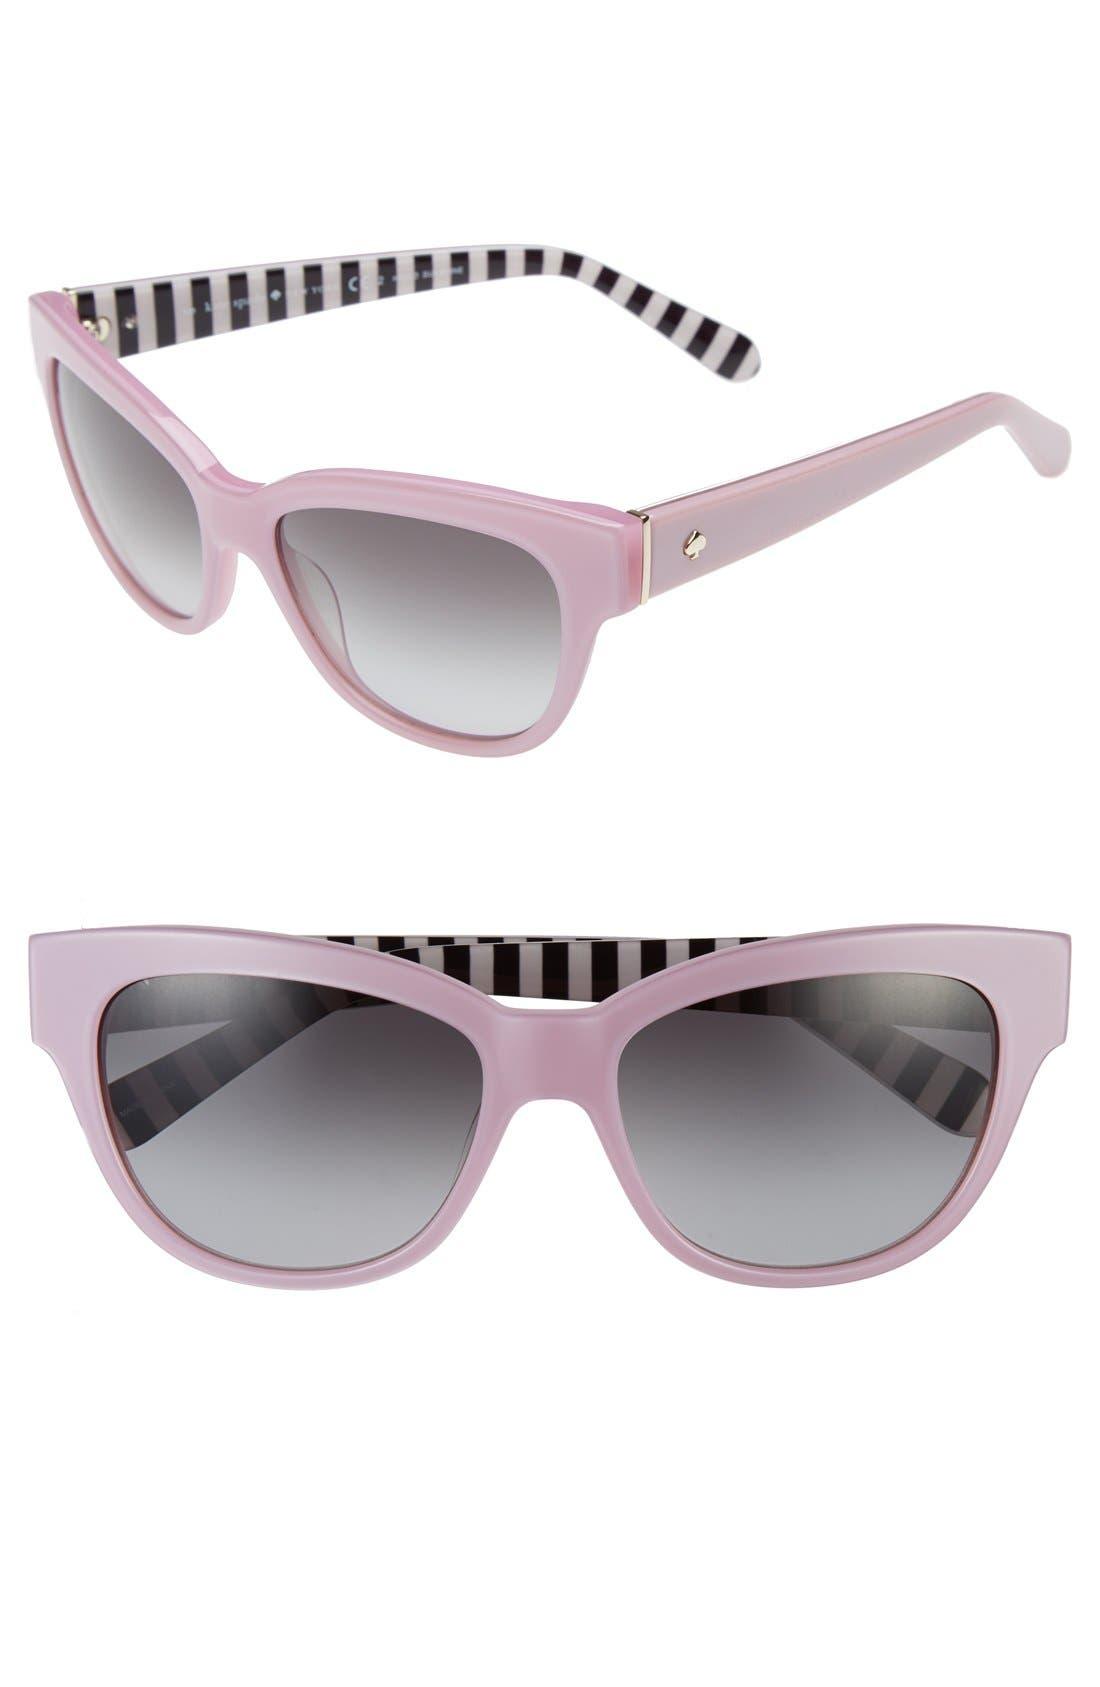 Alternate Image 1 Selected - kate spade new york 'aisha' 54mm cat eye sunglasses